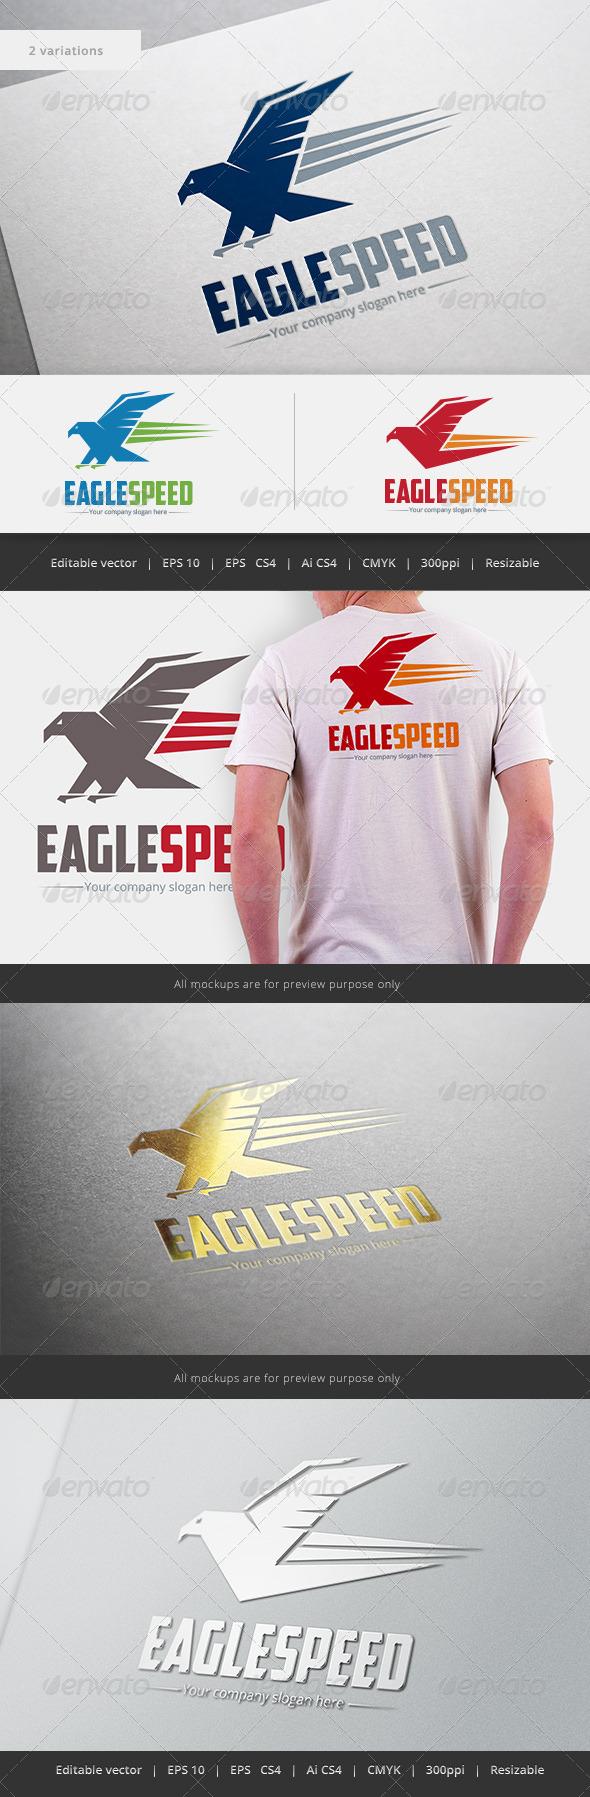 GraphicRiver Eagle Speed Logo 5496399